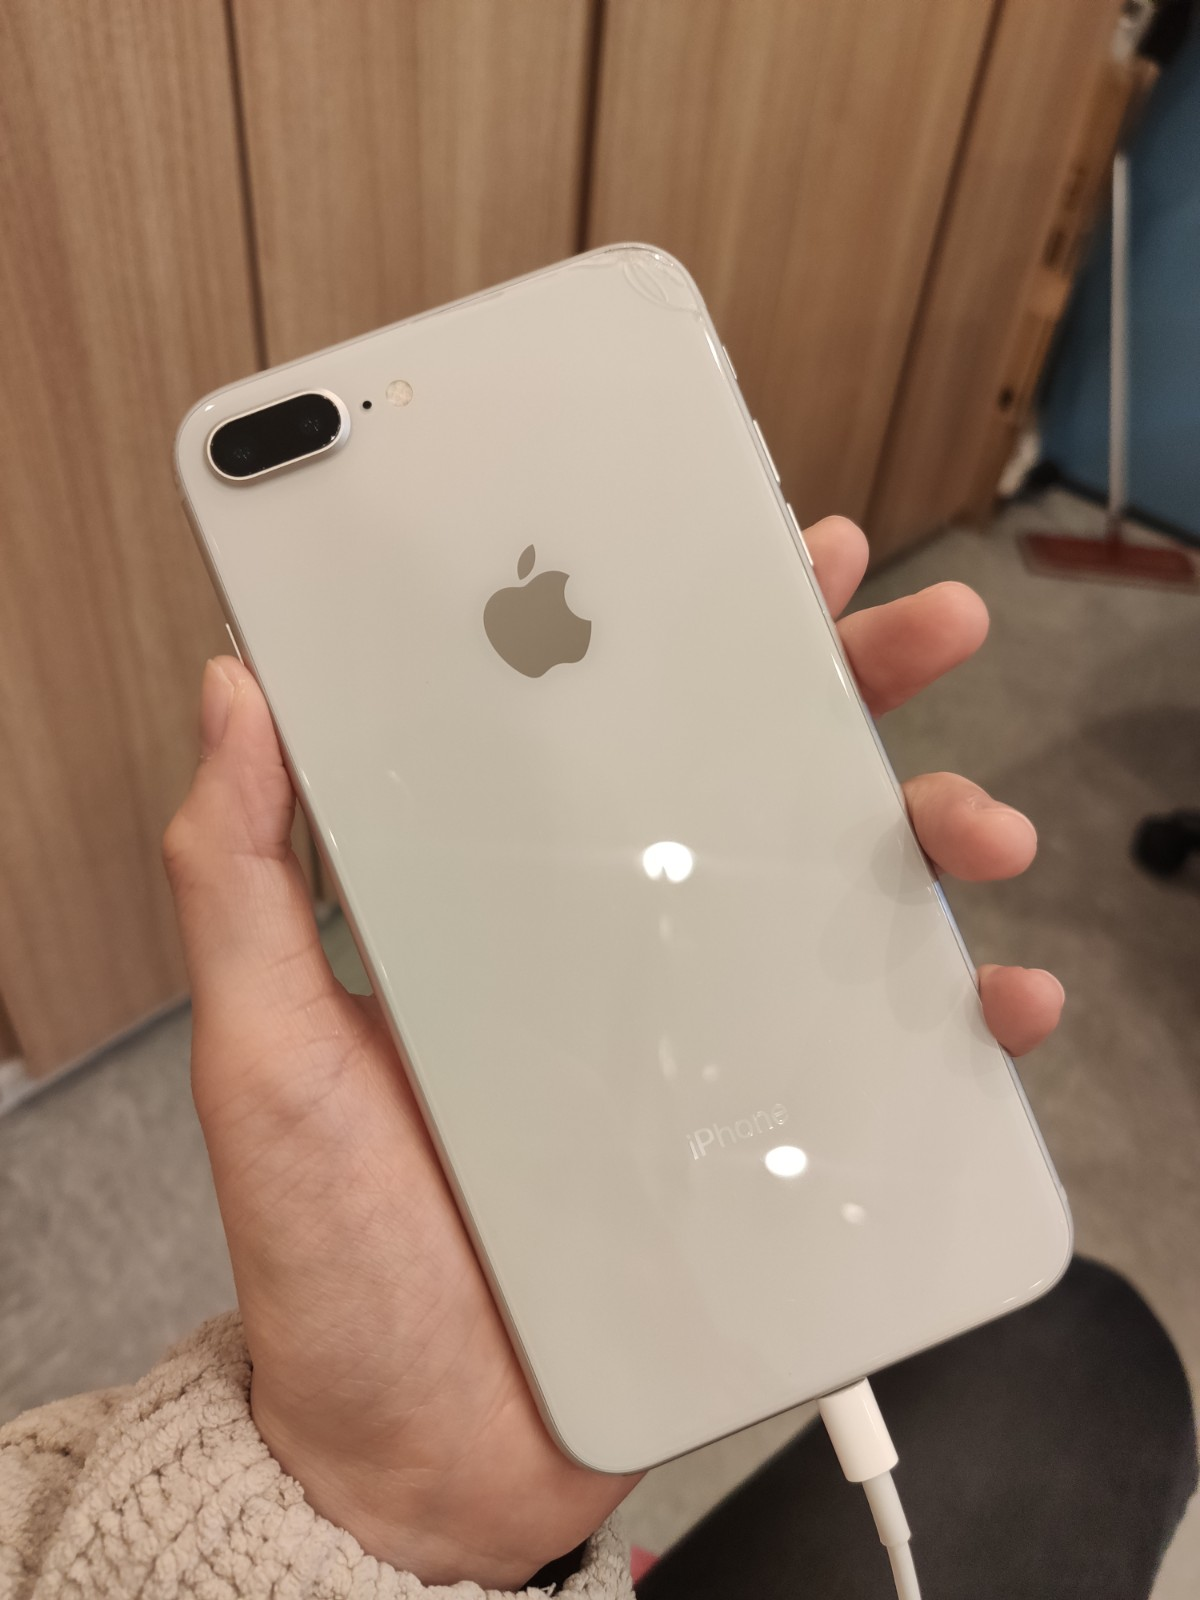 iPhone8Plus 64GB シルバーSIMフリー 背面割れ 画面傷